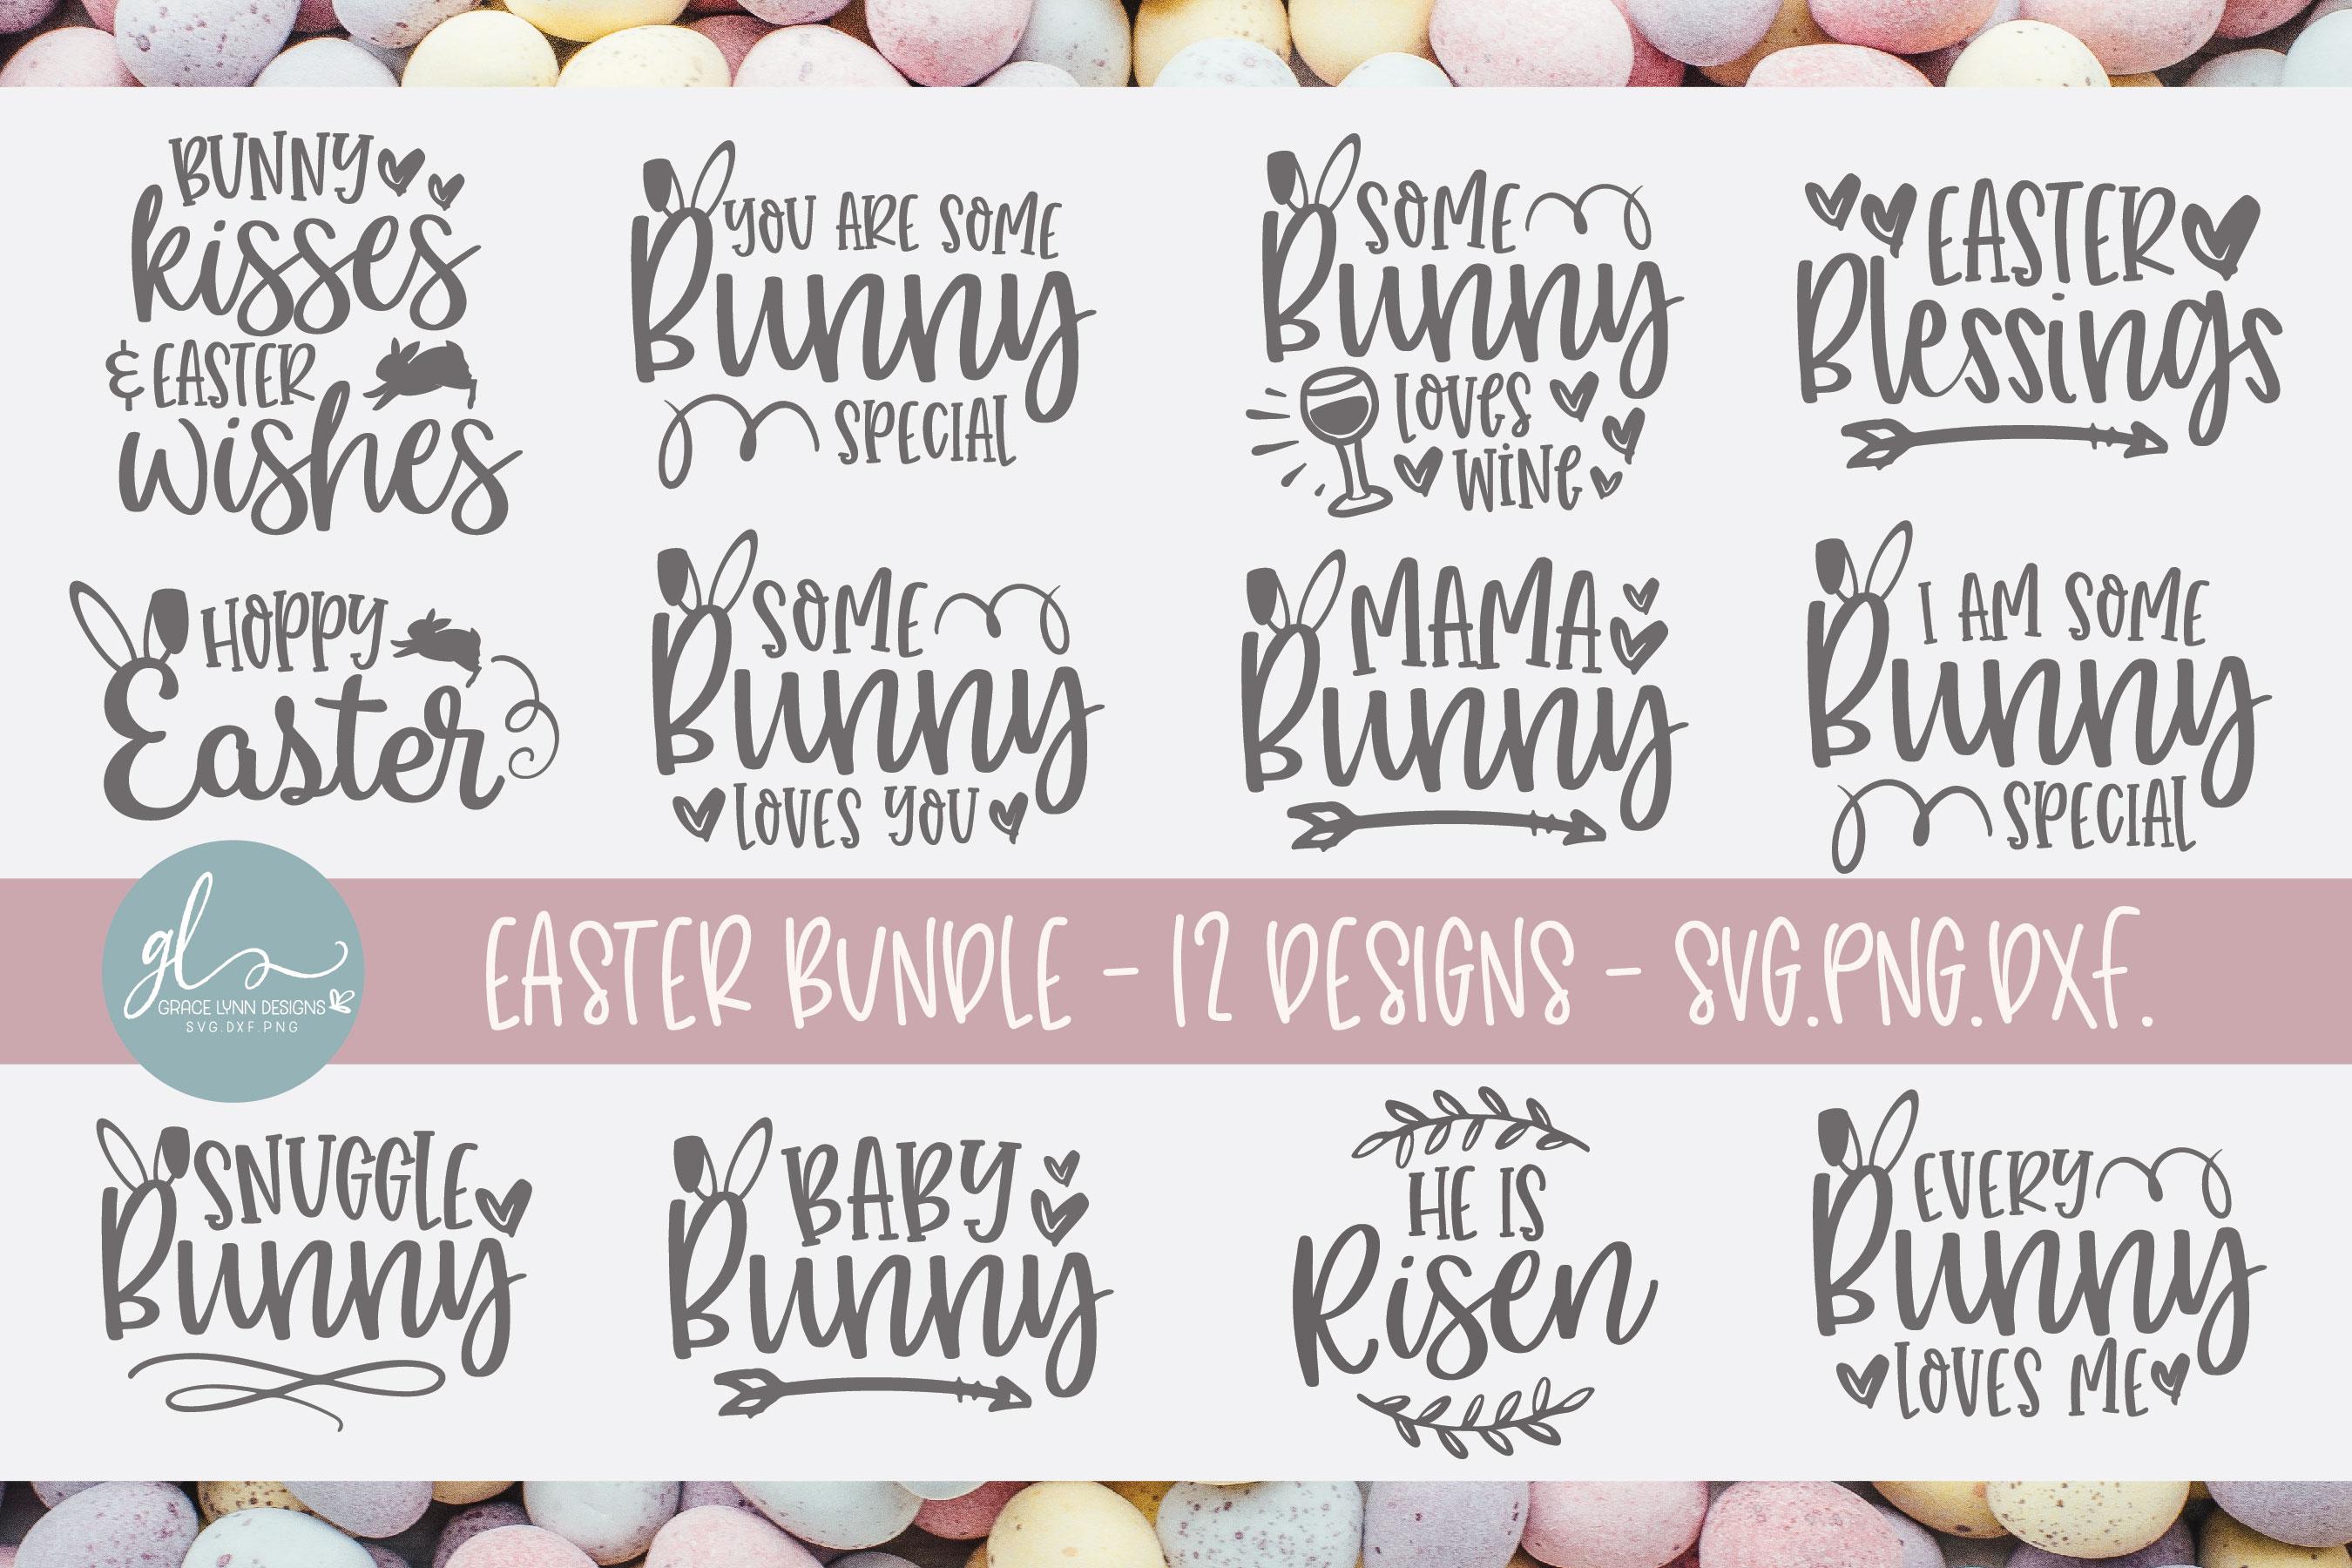 Huge Bundle Of Bundles - 160 SVG Designs - 13 Mini Bundles example image 11